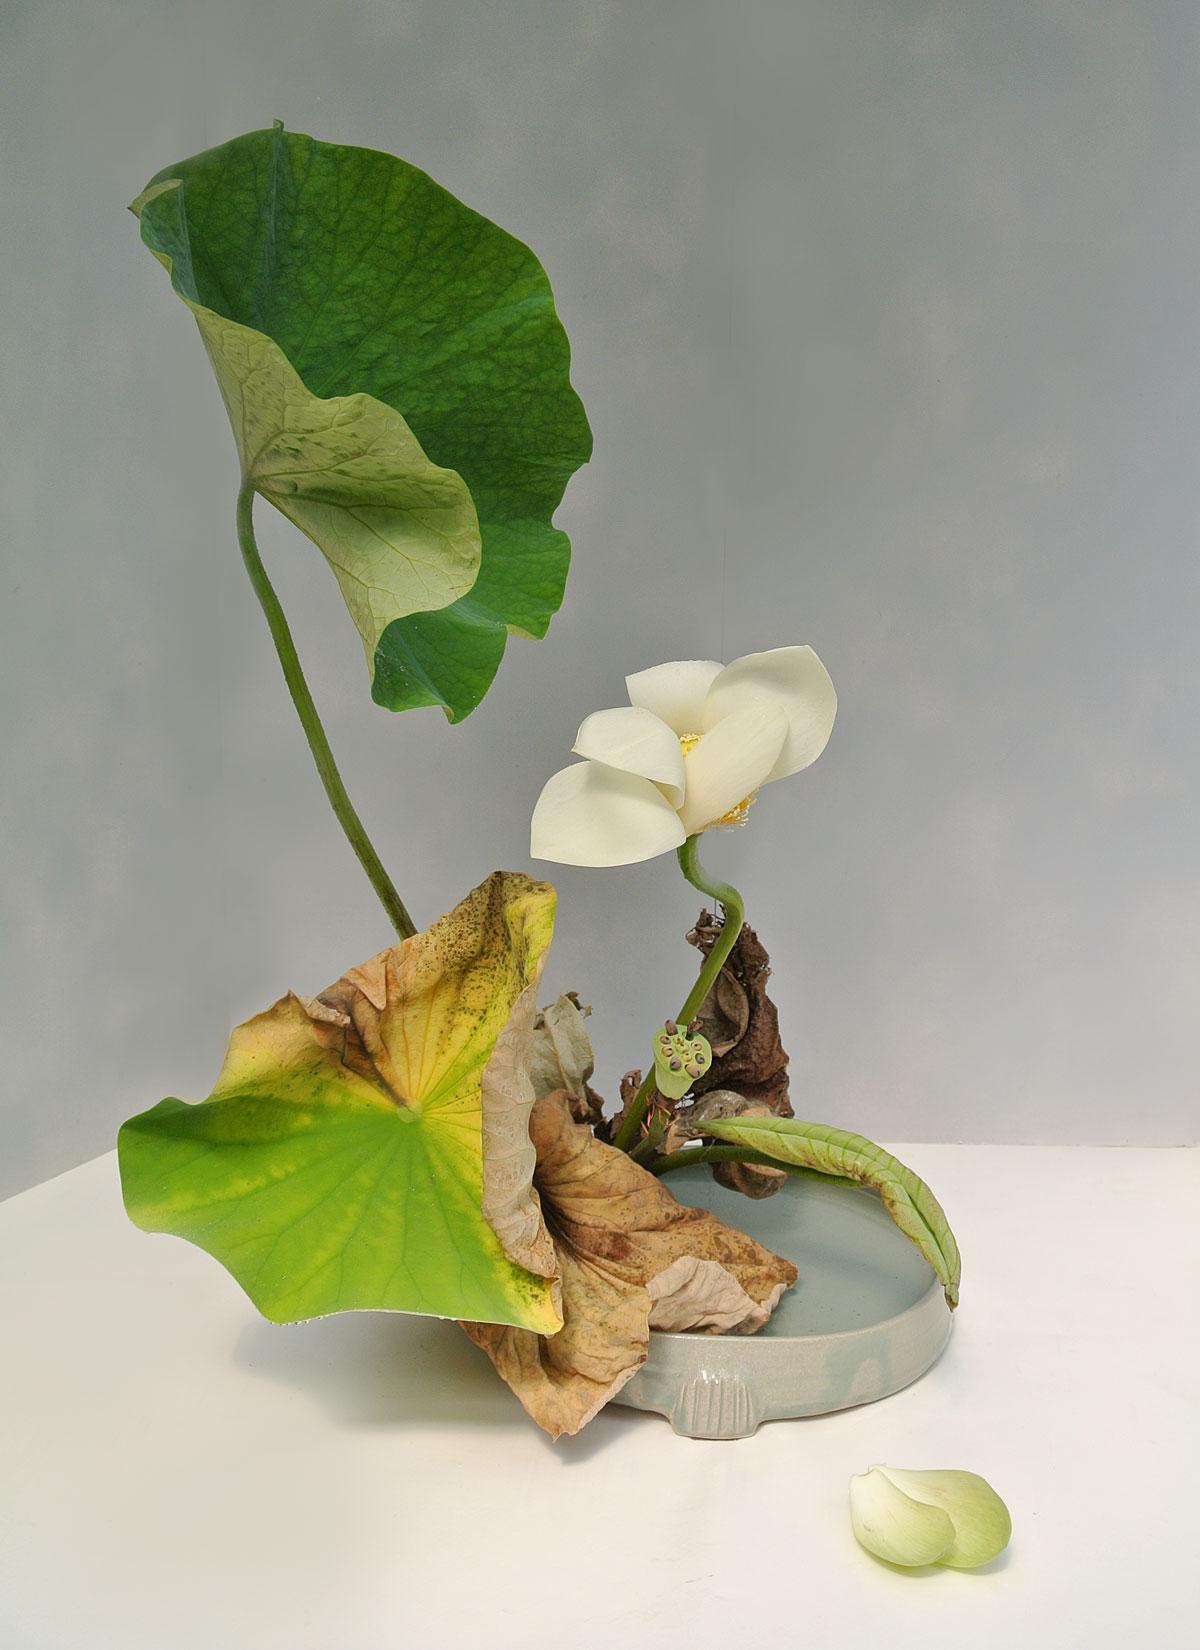 Boel Lindbergh. Ikebana Ohara. Bunjin moribana